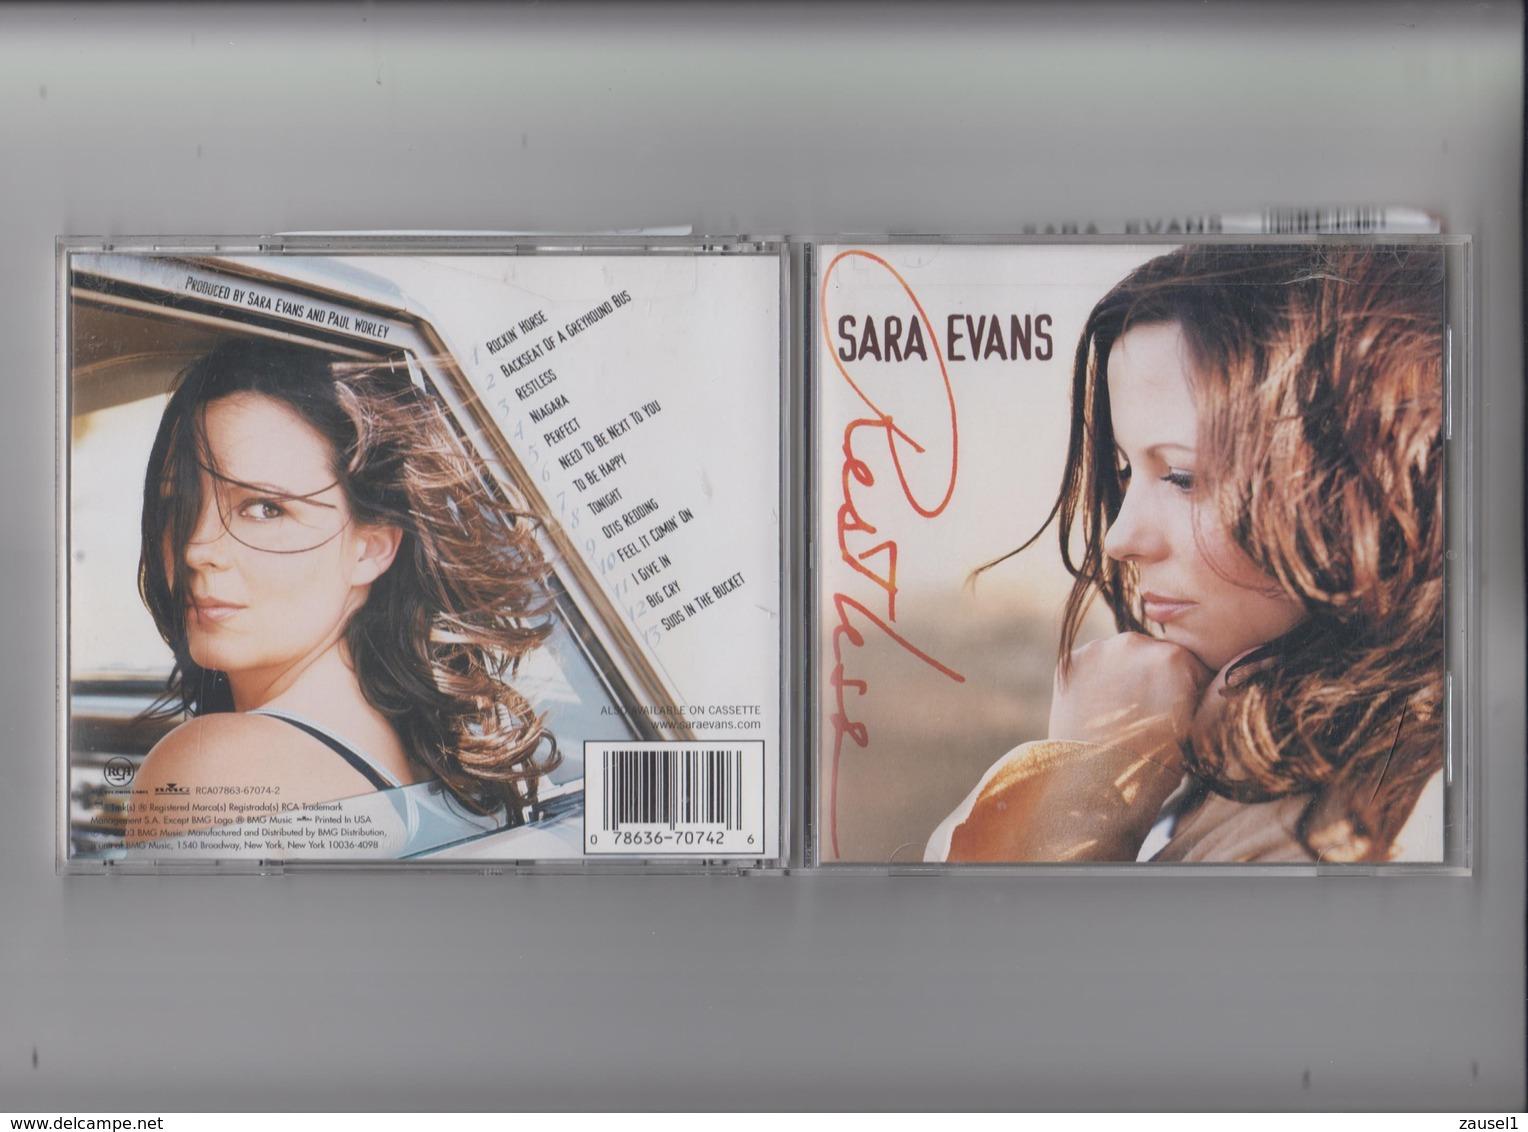 Sara Evans - Restless -  Original CD - Country & Folk